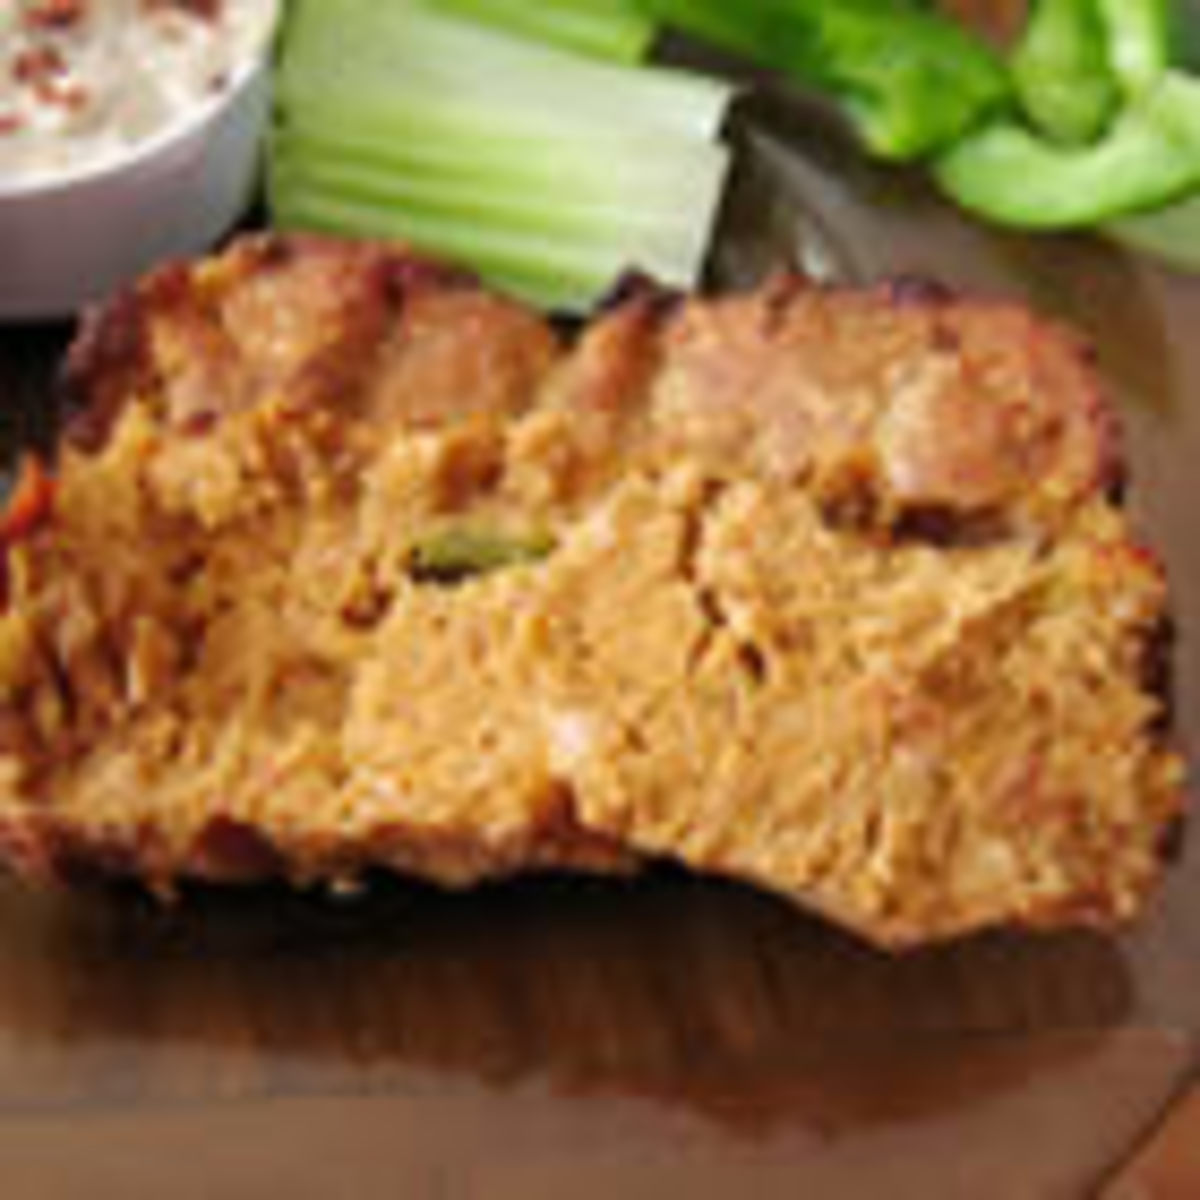 Zesty Chicken Meatloaf (from Allrecipes)